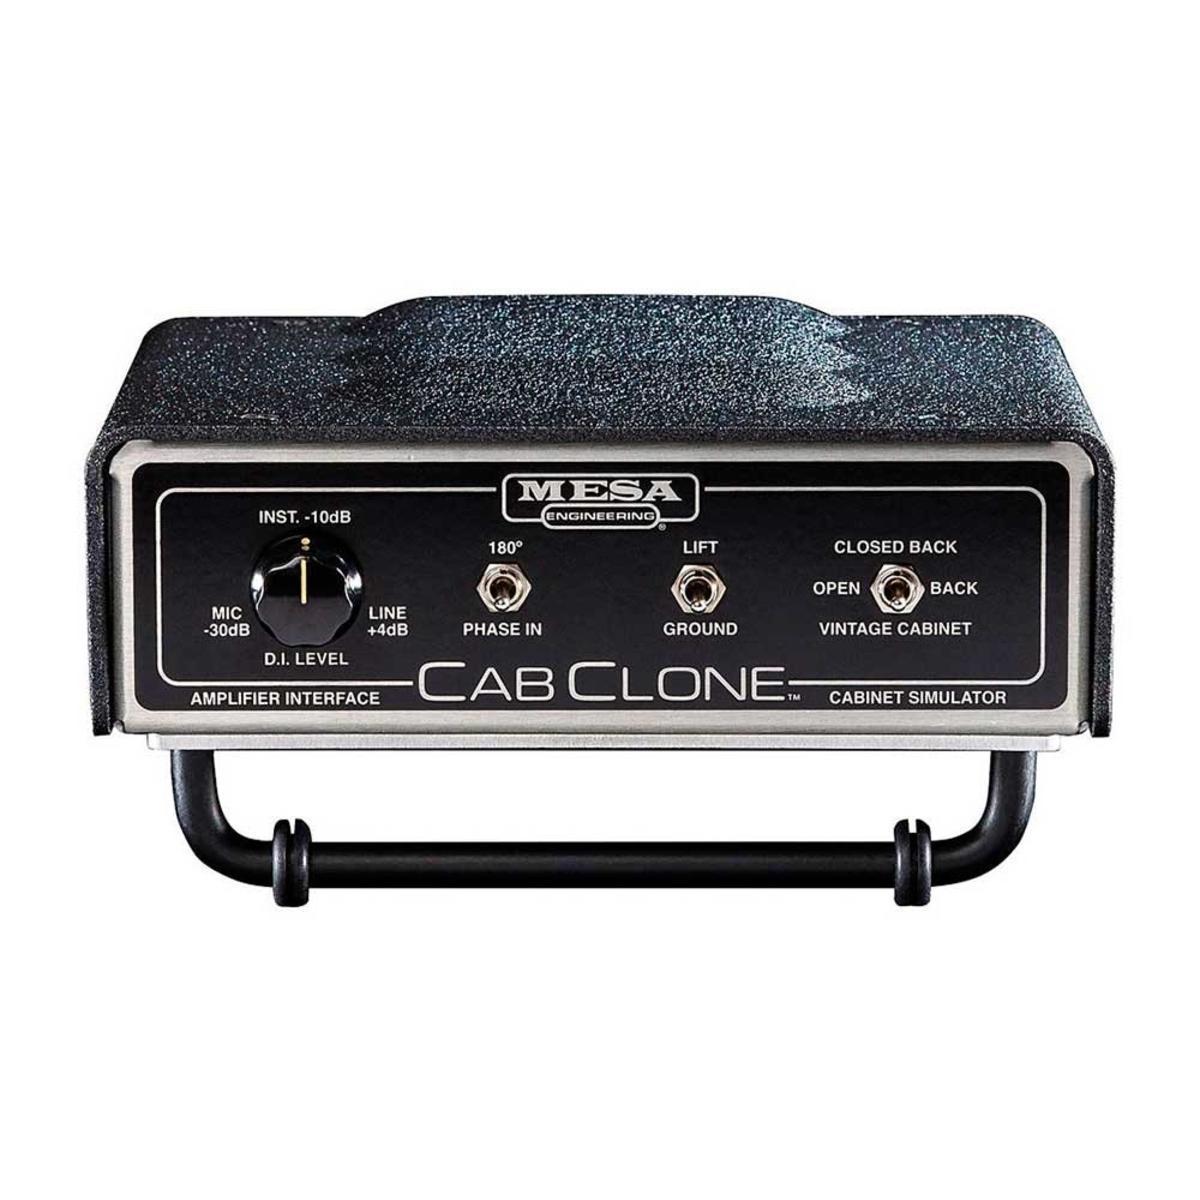 Симулятор гитарного кабинета Mesa Boogie CABCLONE - 8 OHM